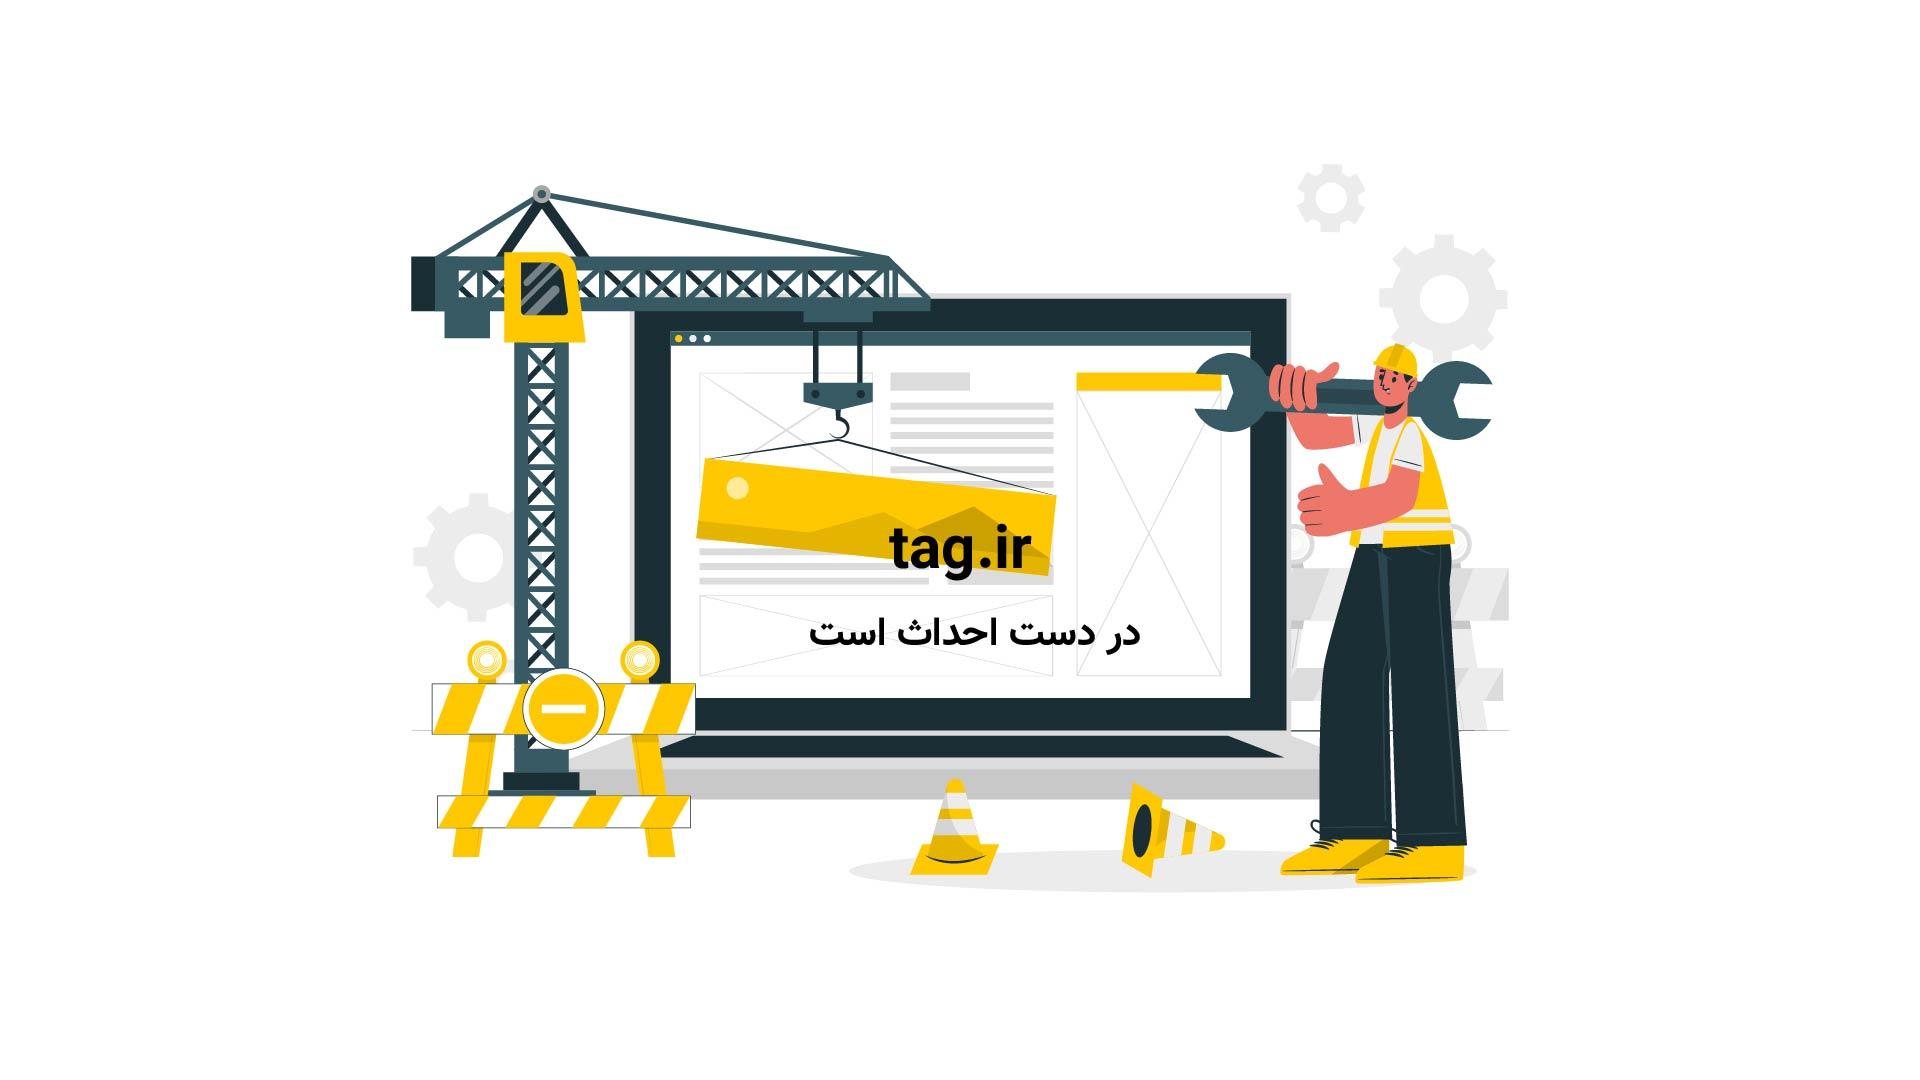 5 گل برتر هفته هفتم لیگ برتر انگلیس